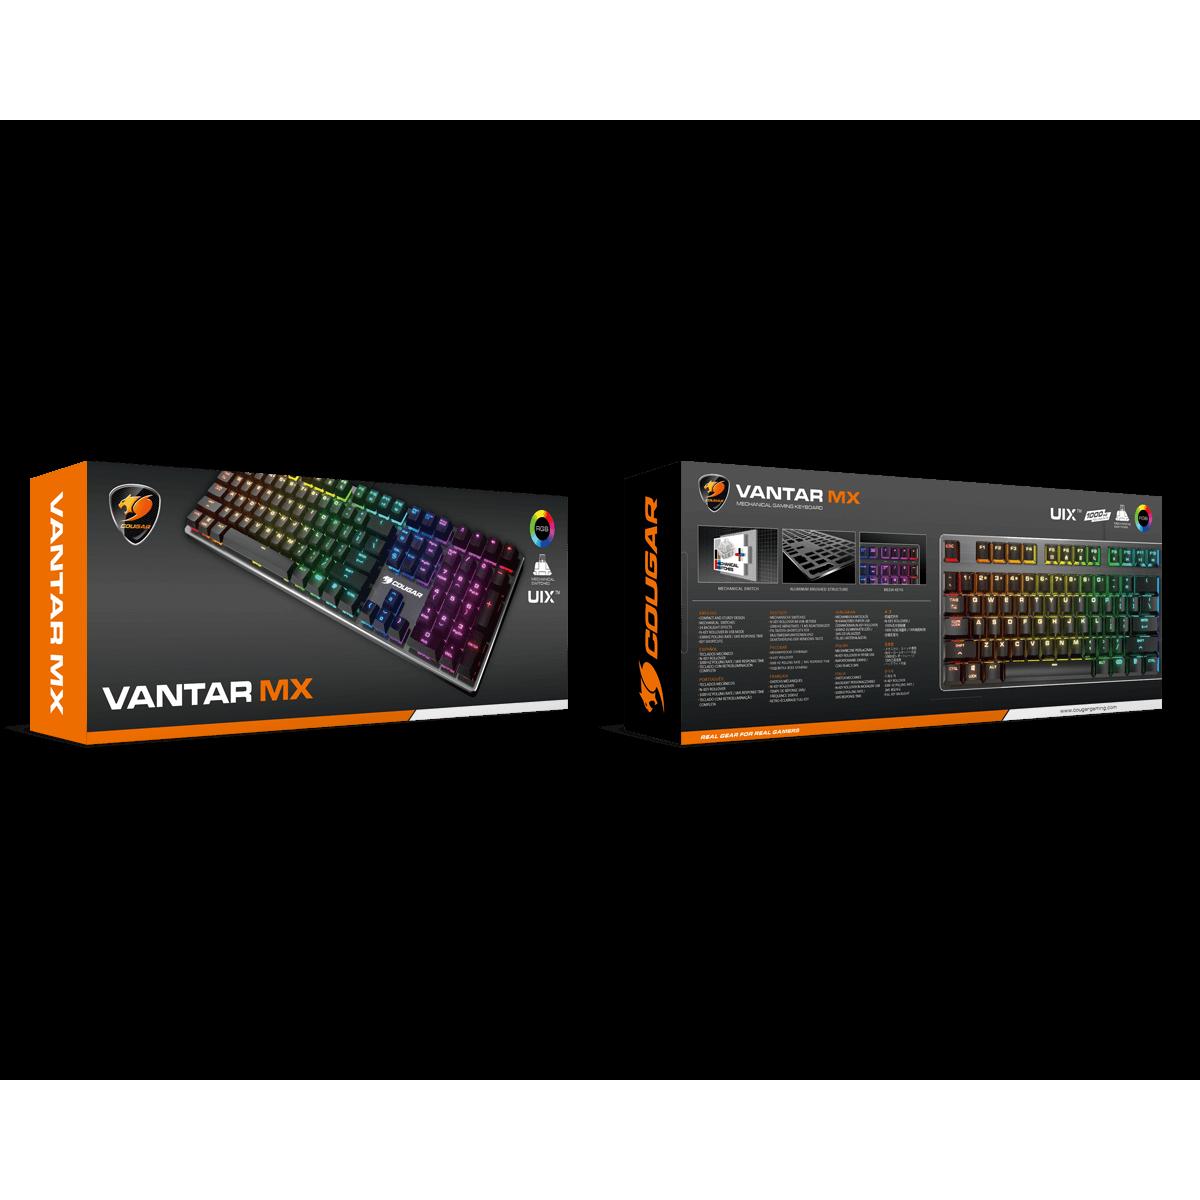 Teclado Gamer Cougar Vantar MX, Switch Red, RGB, ABNT2, Black, 37VAMM1SB-0004